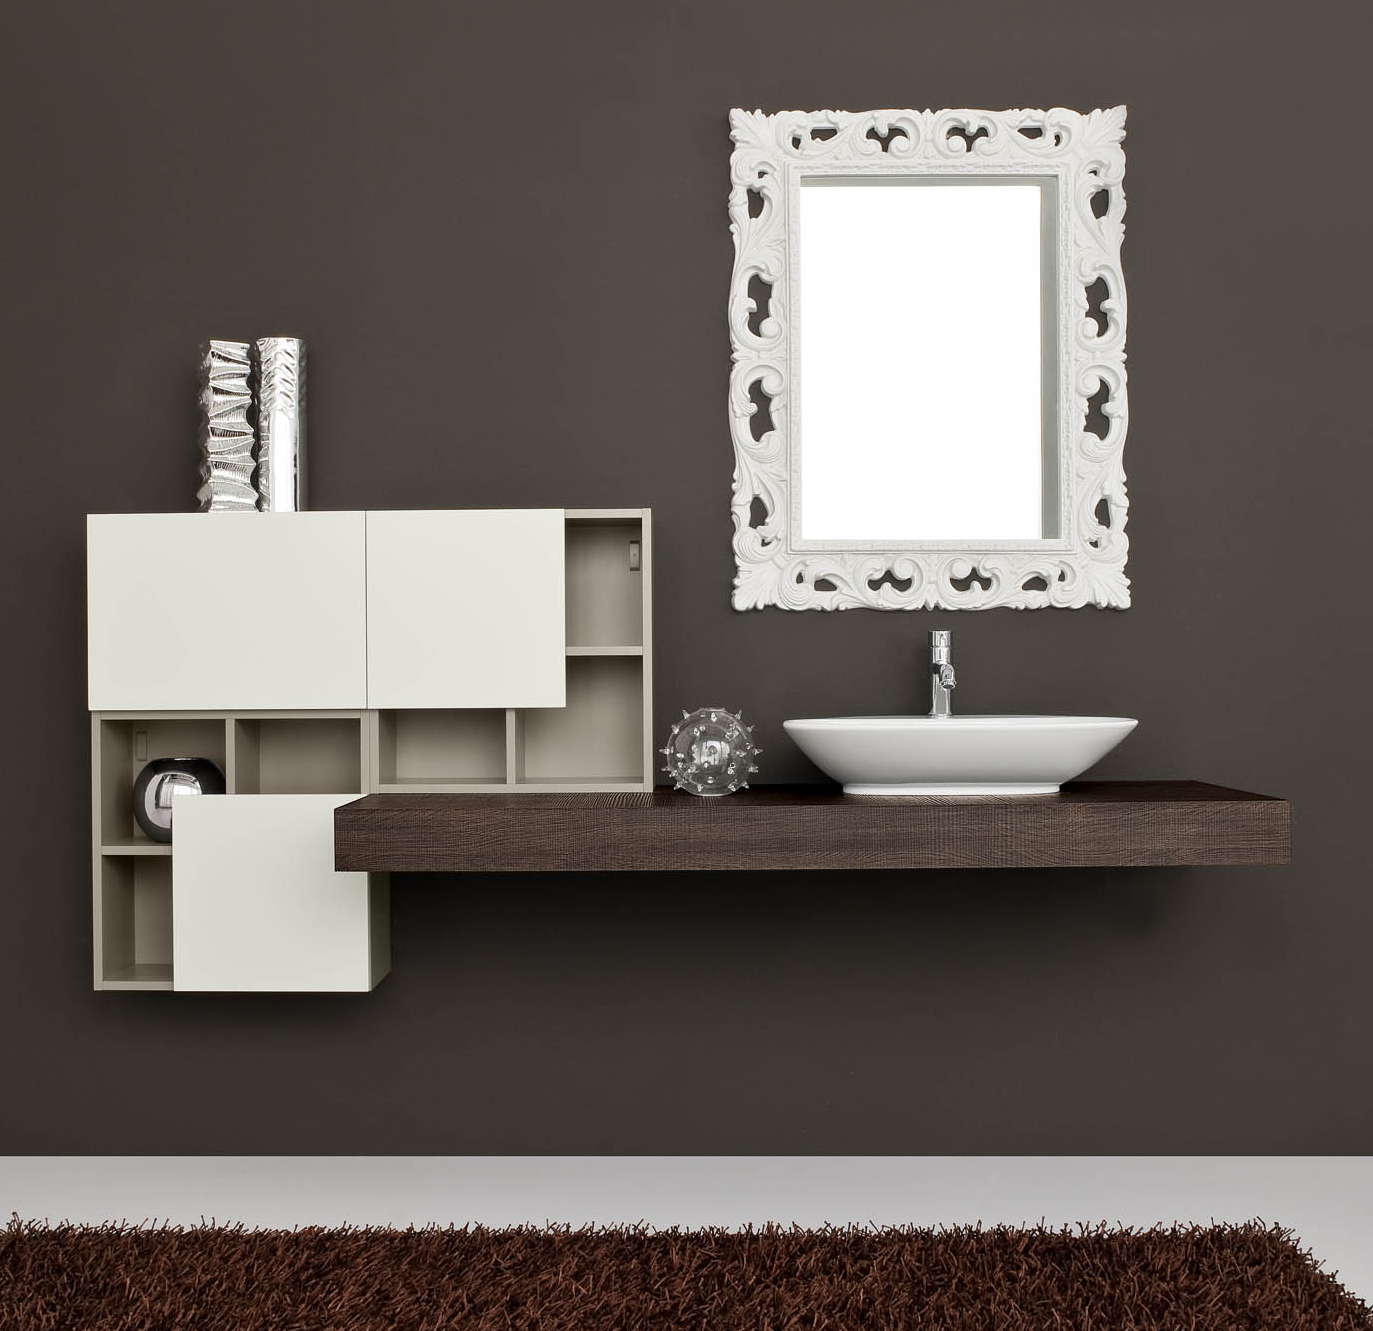 Modern bathroom design @ http://www.lops.it/prodotti/Bagni/Arredo+ ...